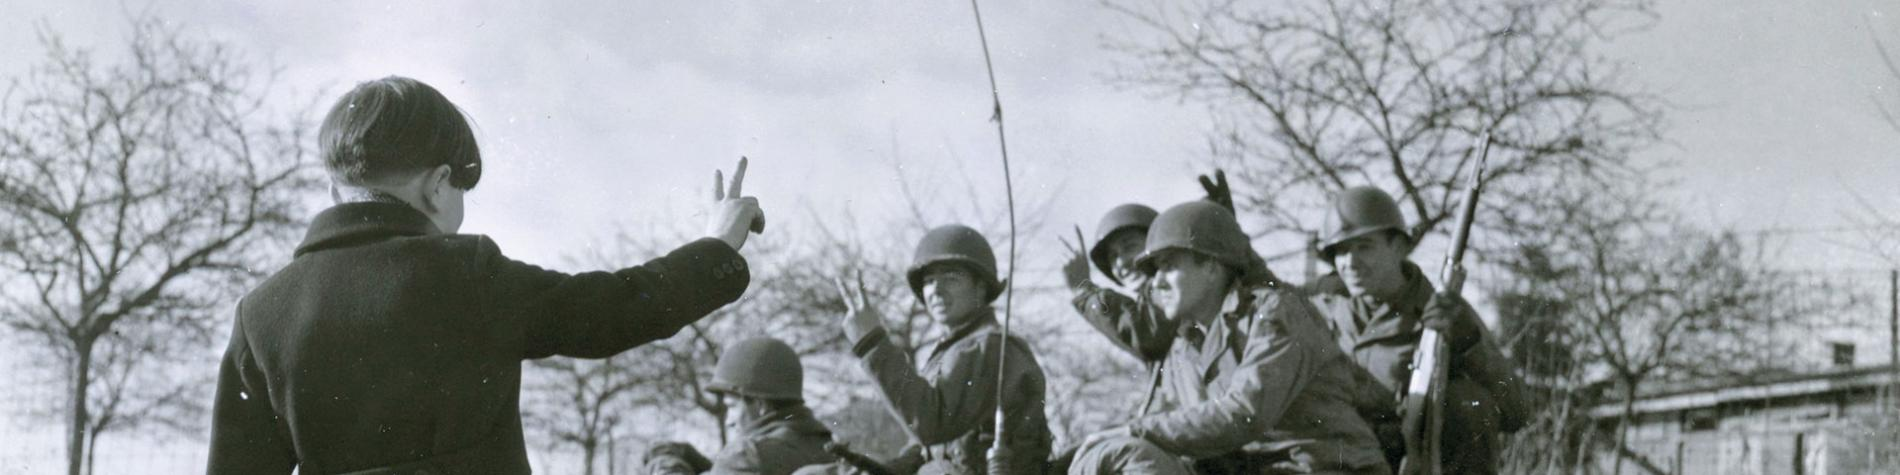 Bataille - Ardennes - libération - 40-45